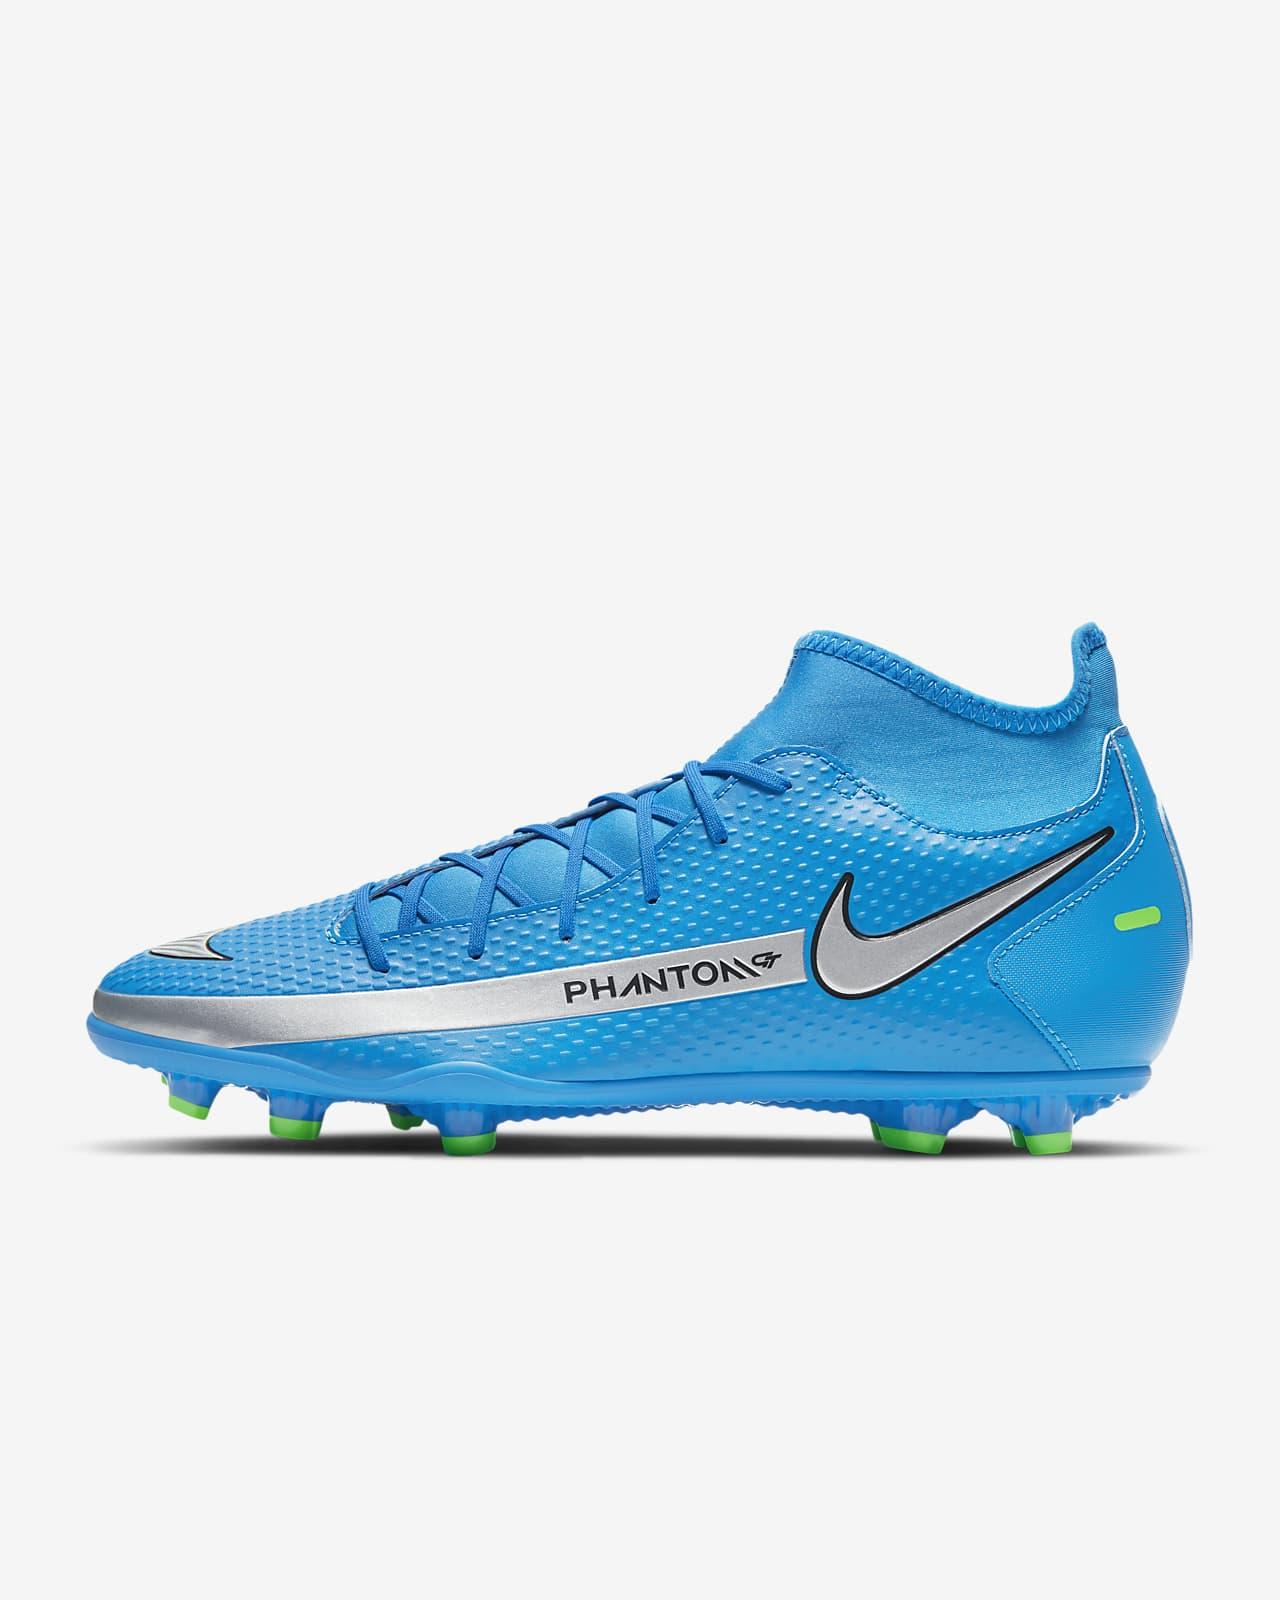 Chaussure de football multi-surfaces à crampons Nike Phantom GT Club Dynamic Fit MG